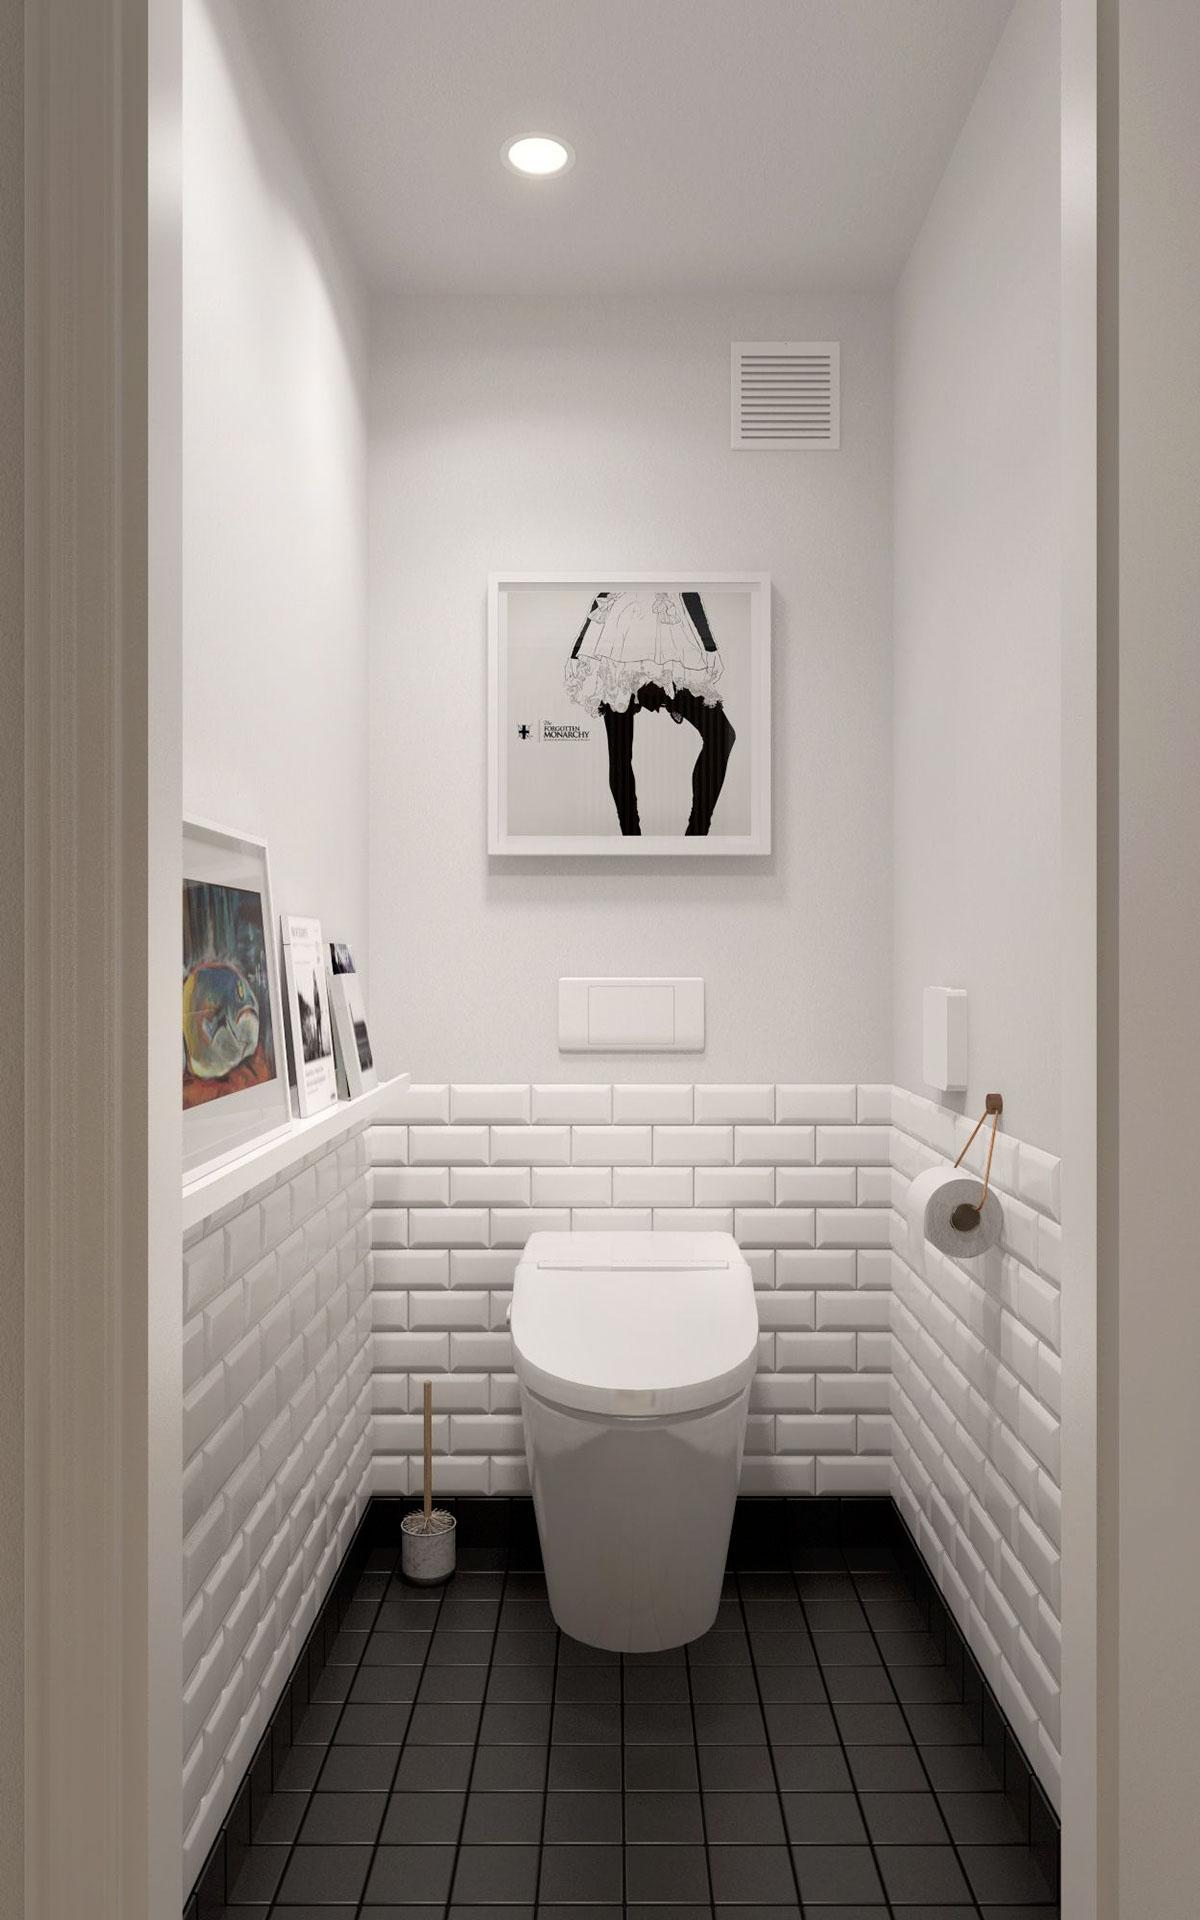 ВИНТАЖНАЯ квартира со скандинавскими нотками: фотообзор